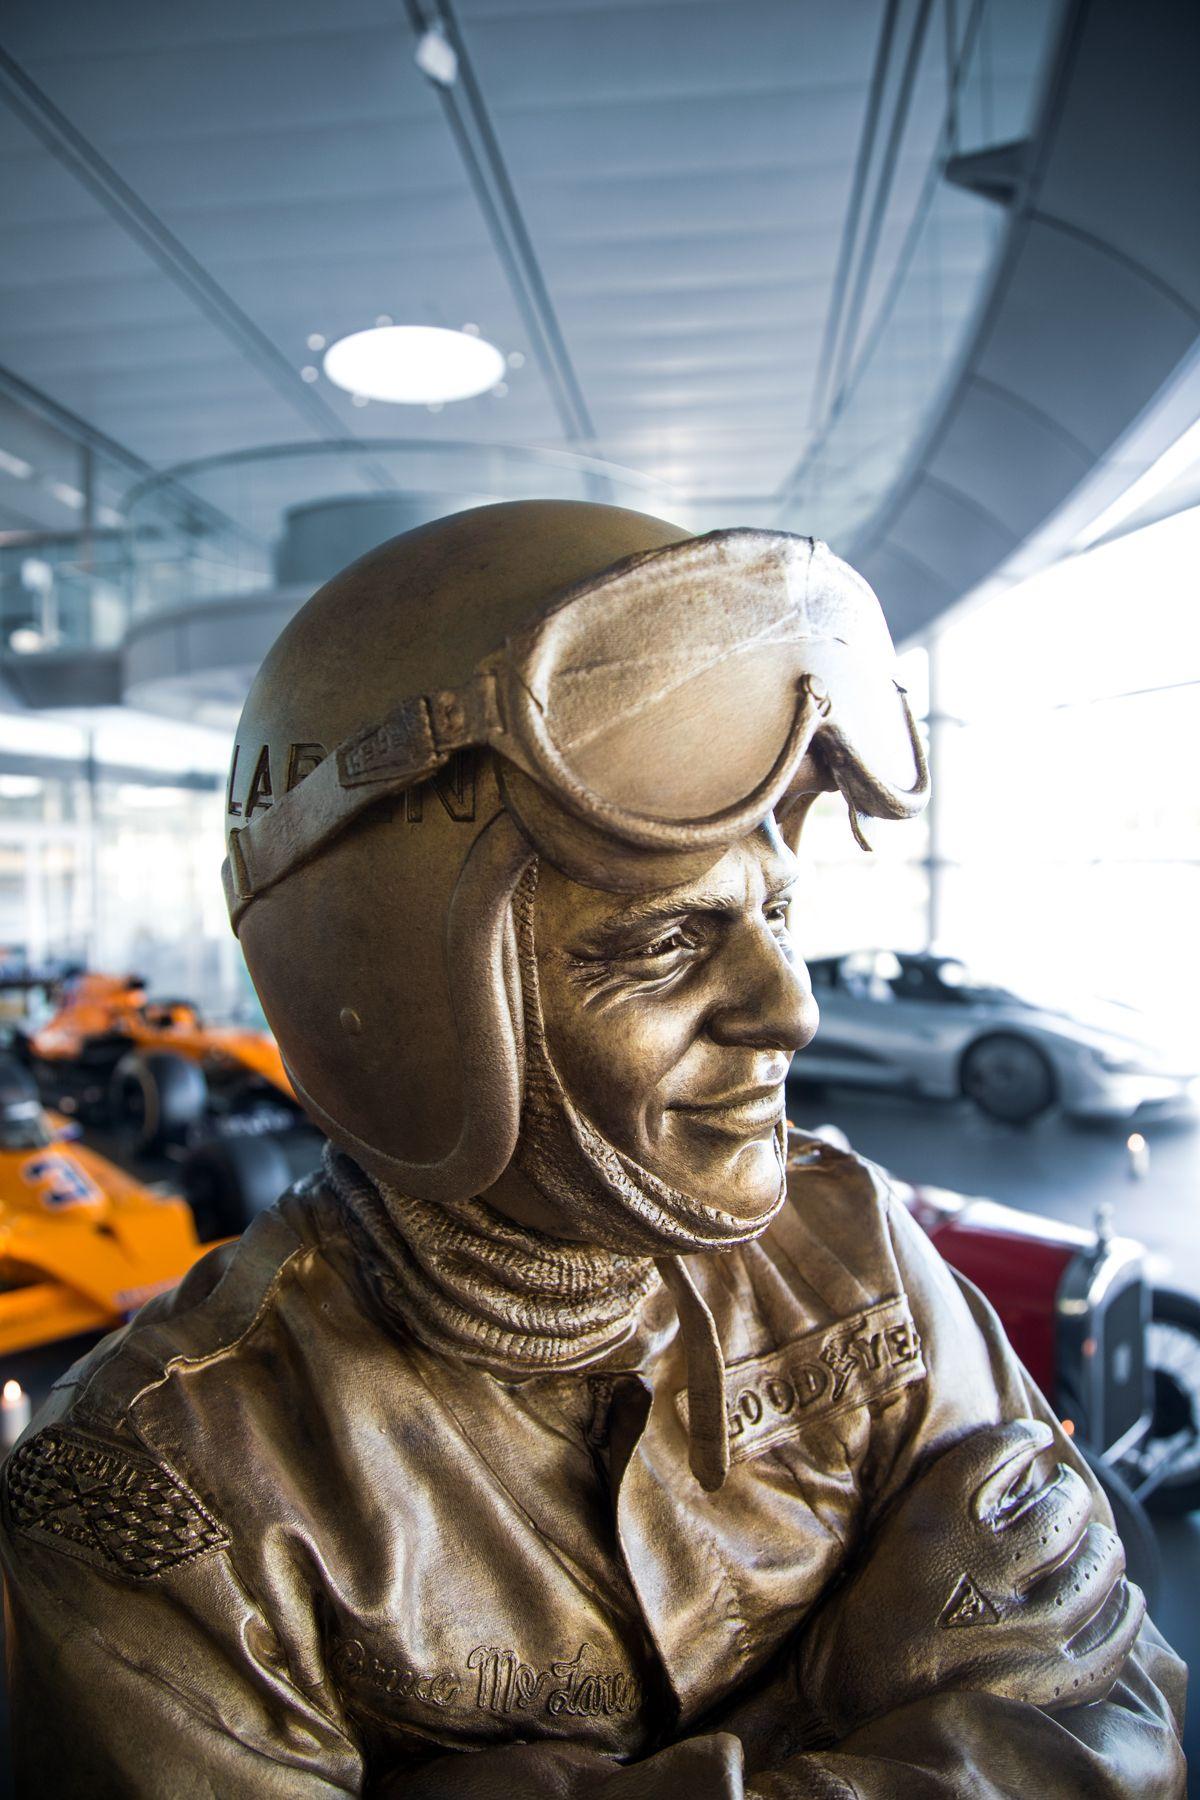 02062020_Bruce McLaren statue_02